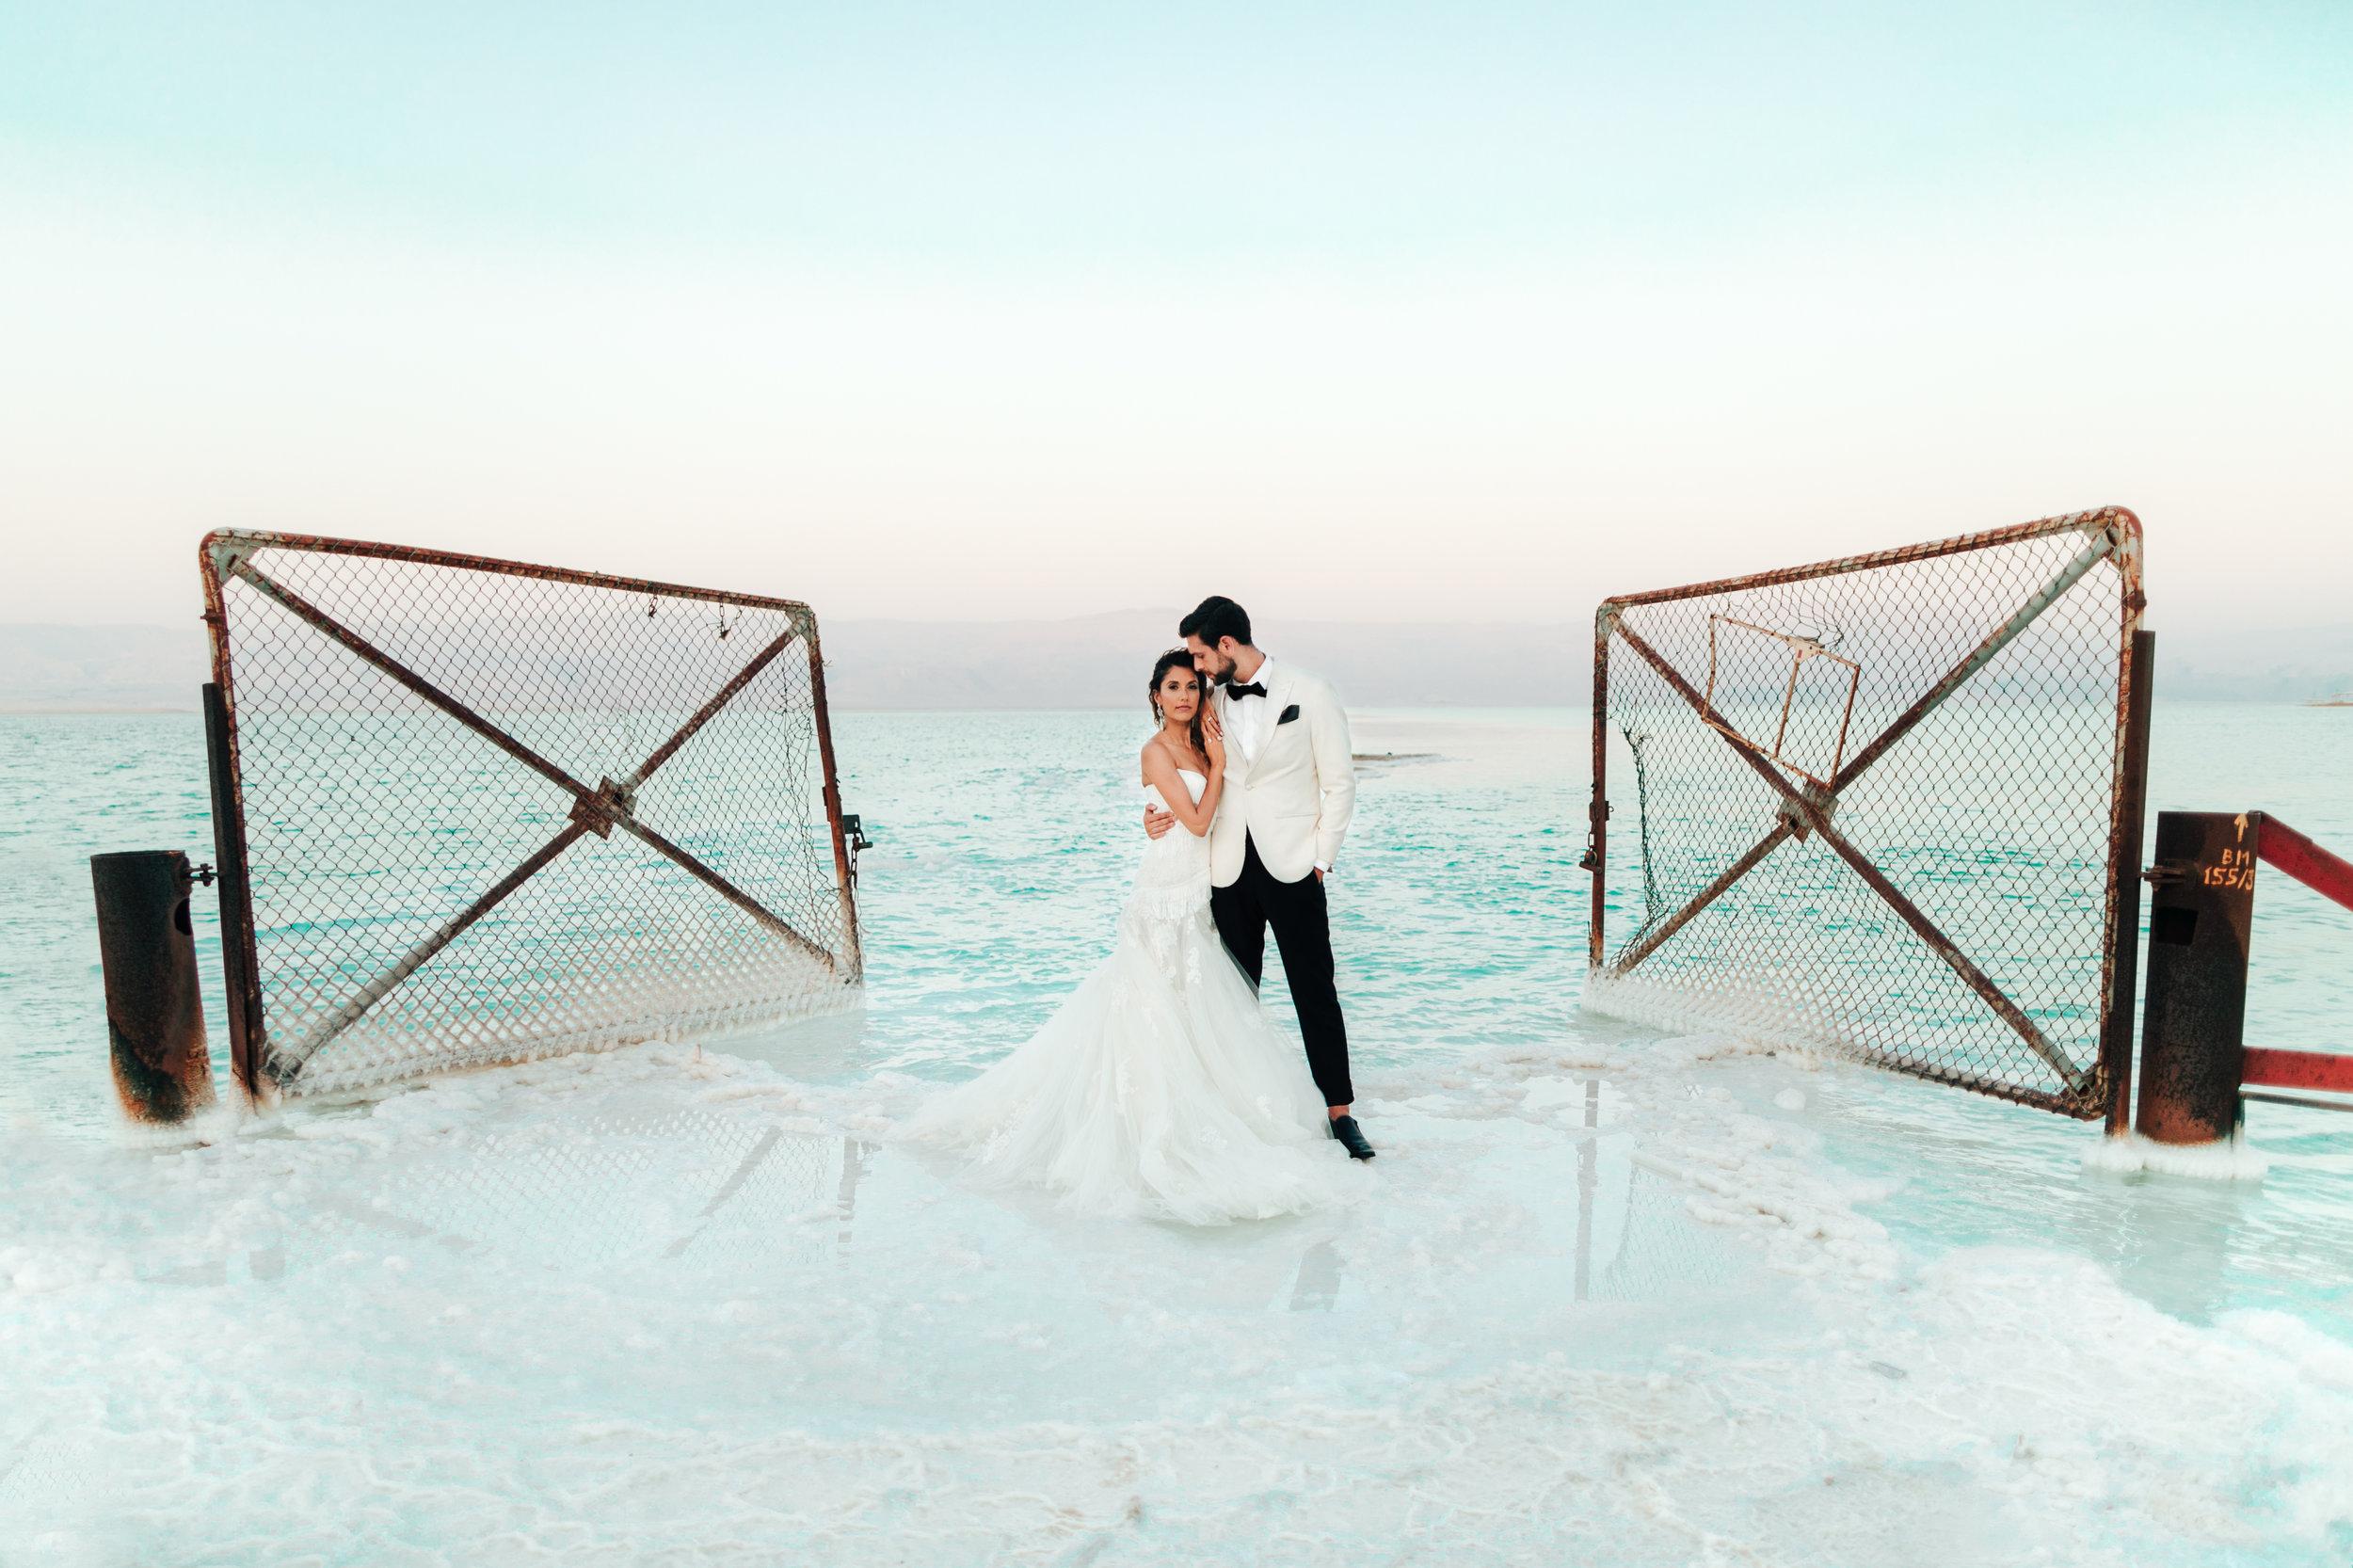 Anée Atelier Israel Nathalie Karynina Bride 11